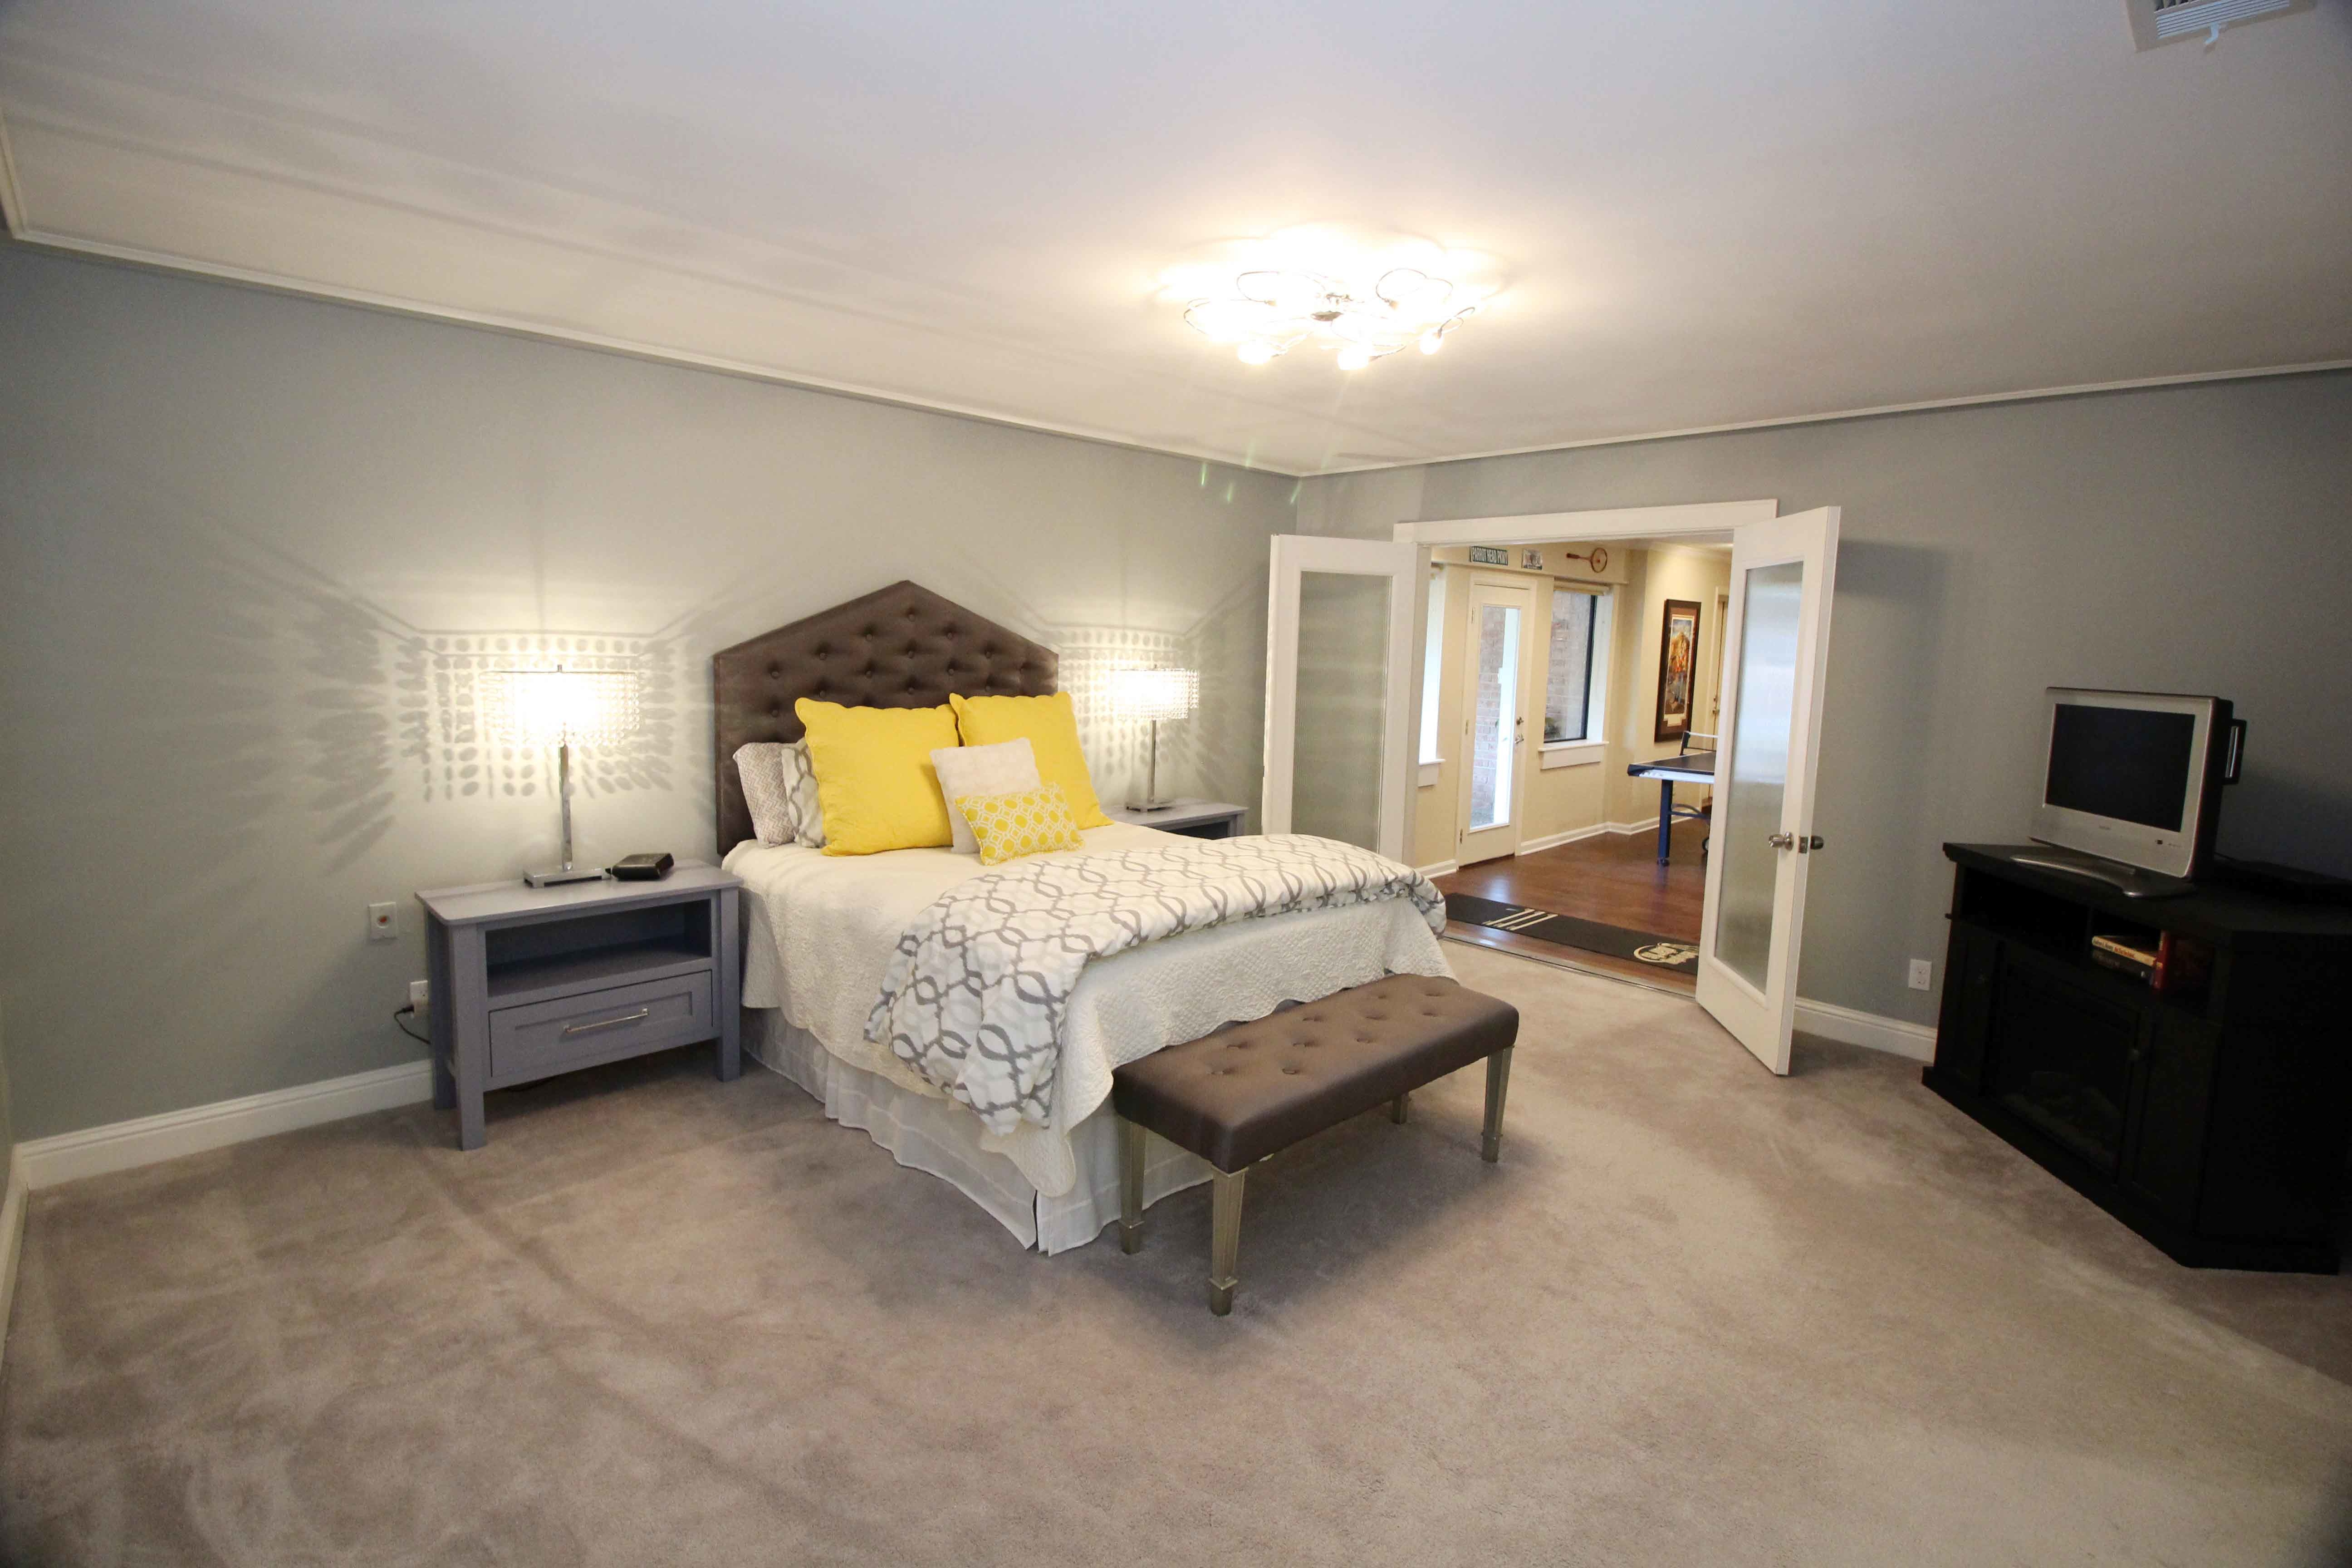 Showcase Homes & Remodeling LLC image 3